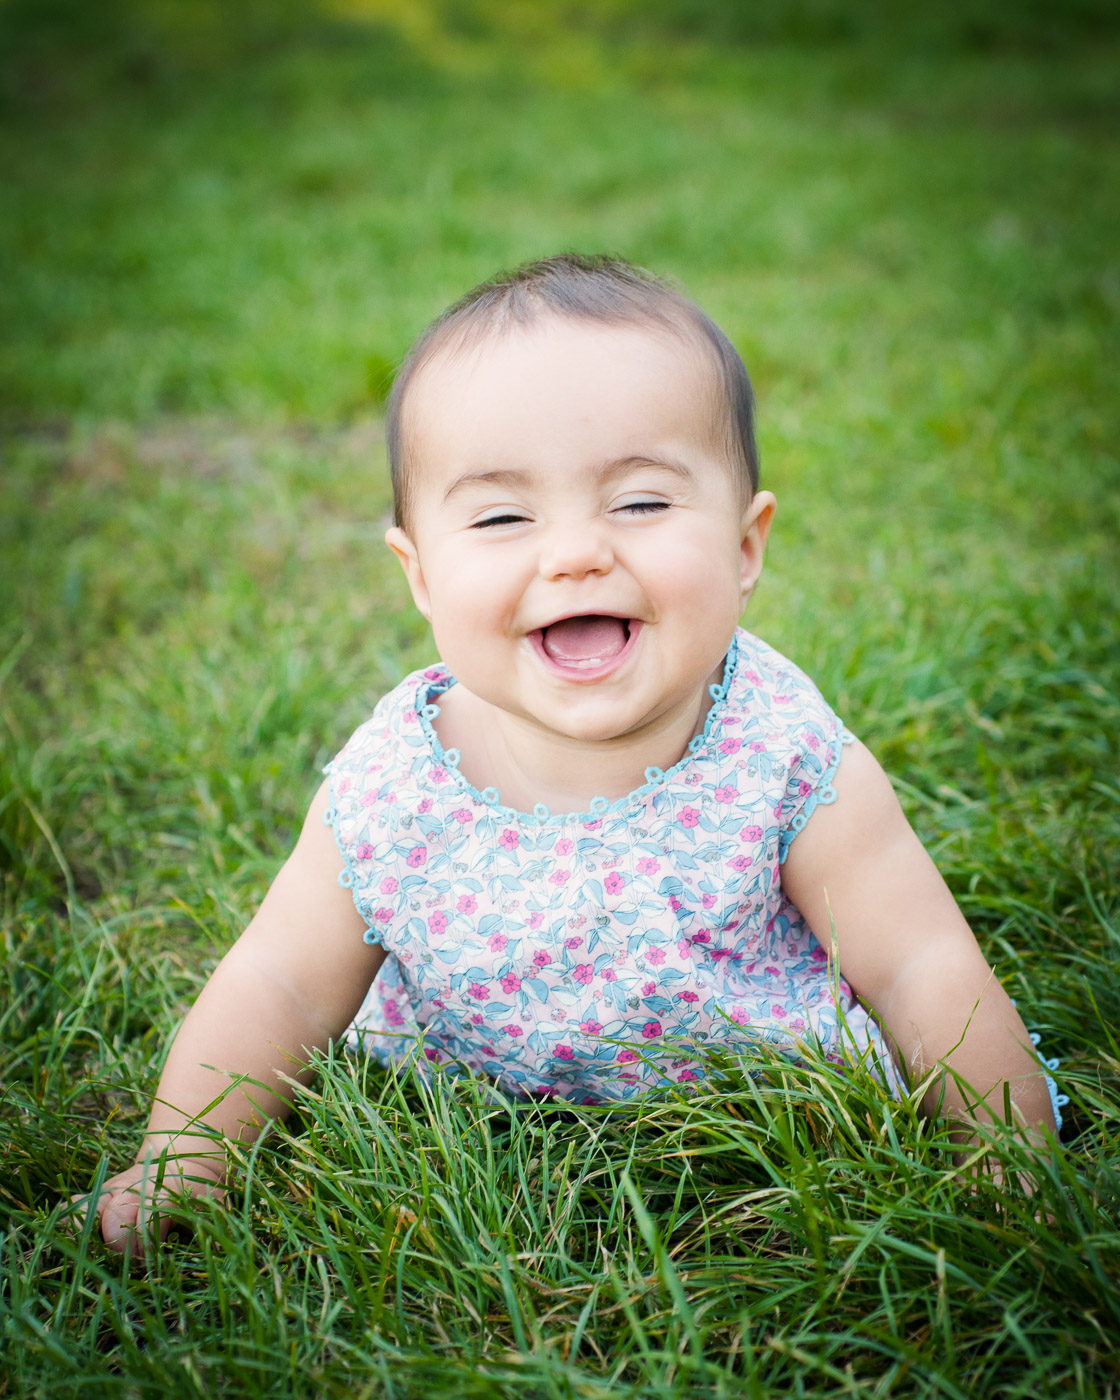 Baby portrait photography - Prospect Park, Brooklyn